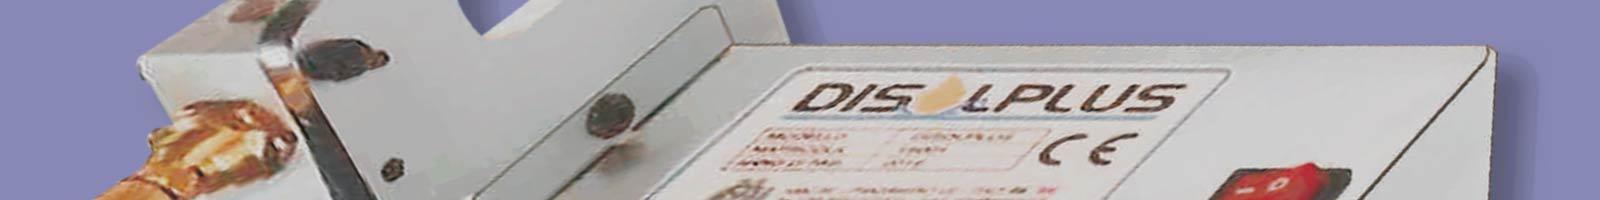 Disoleatore Disolplus – Cod. DS300